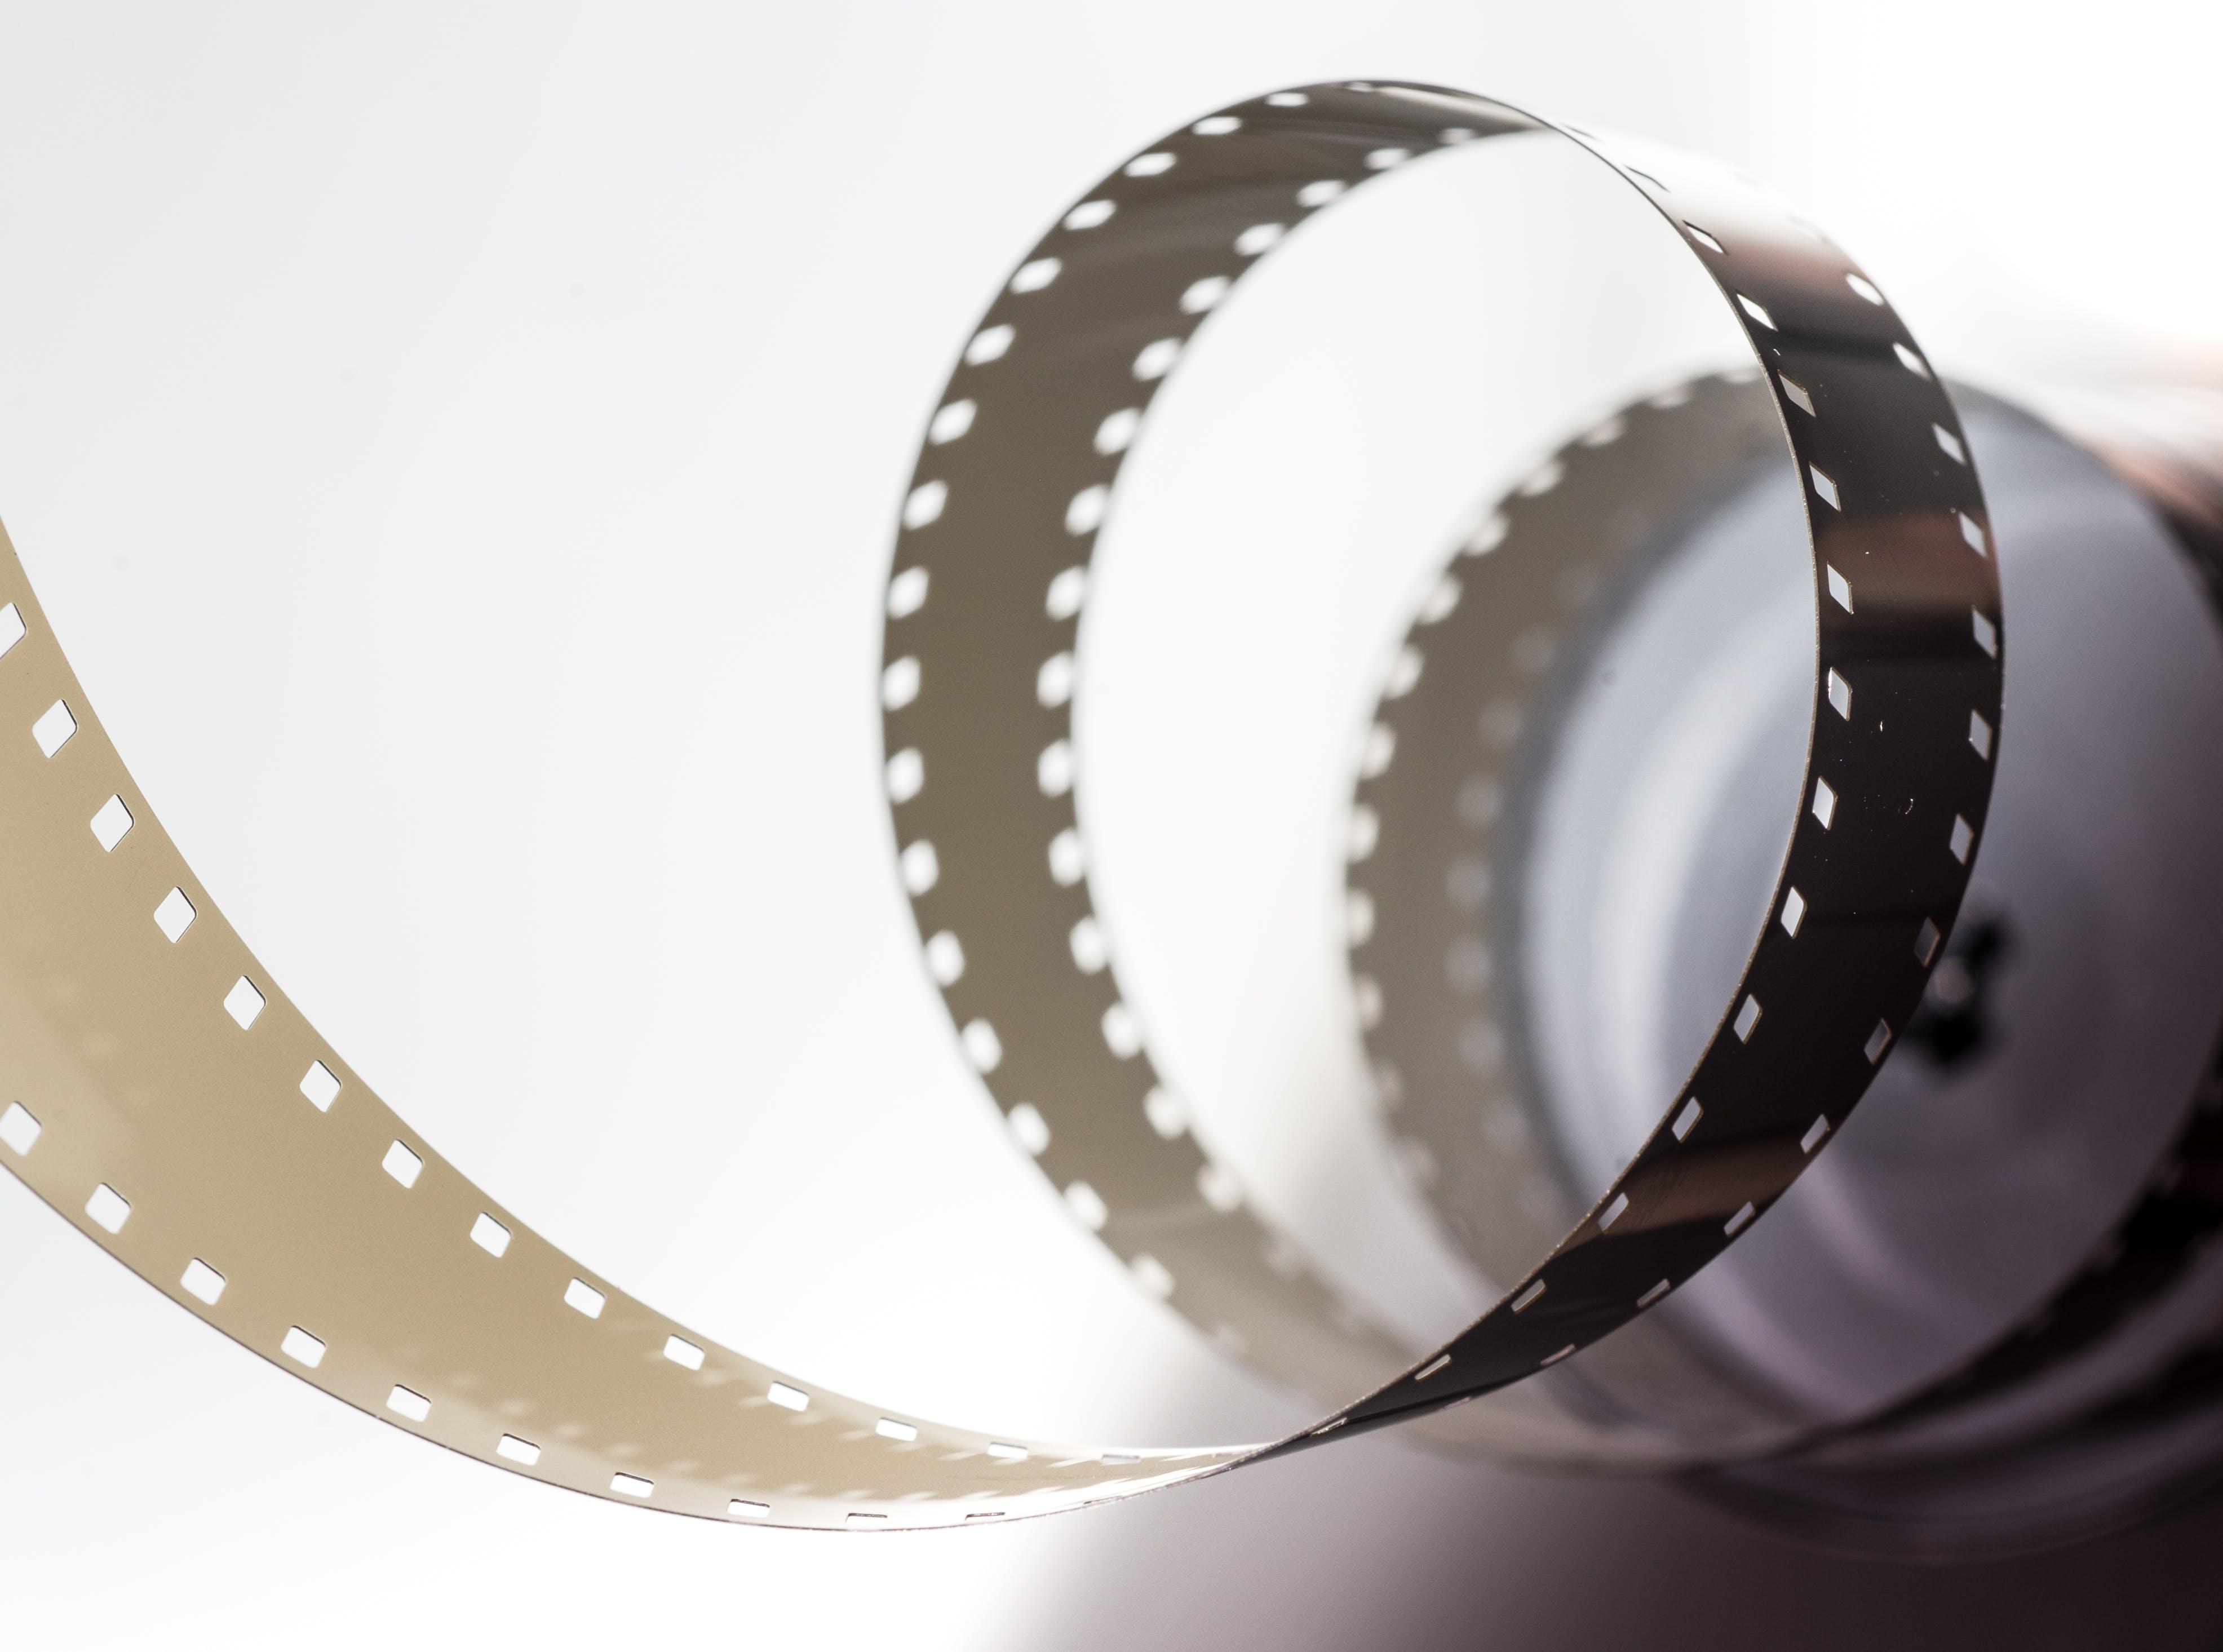 https://images.pexels.com/photos/390089/film-movie-motion-picture-390089.jpeg?auto=compress&cs=tinysrgb&dpr=2&h=350